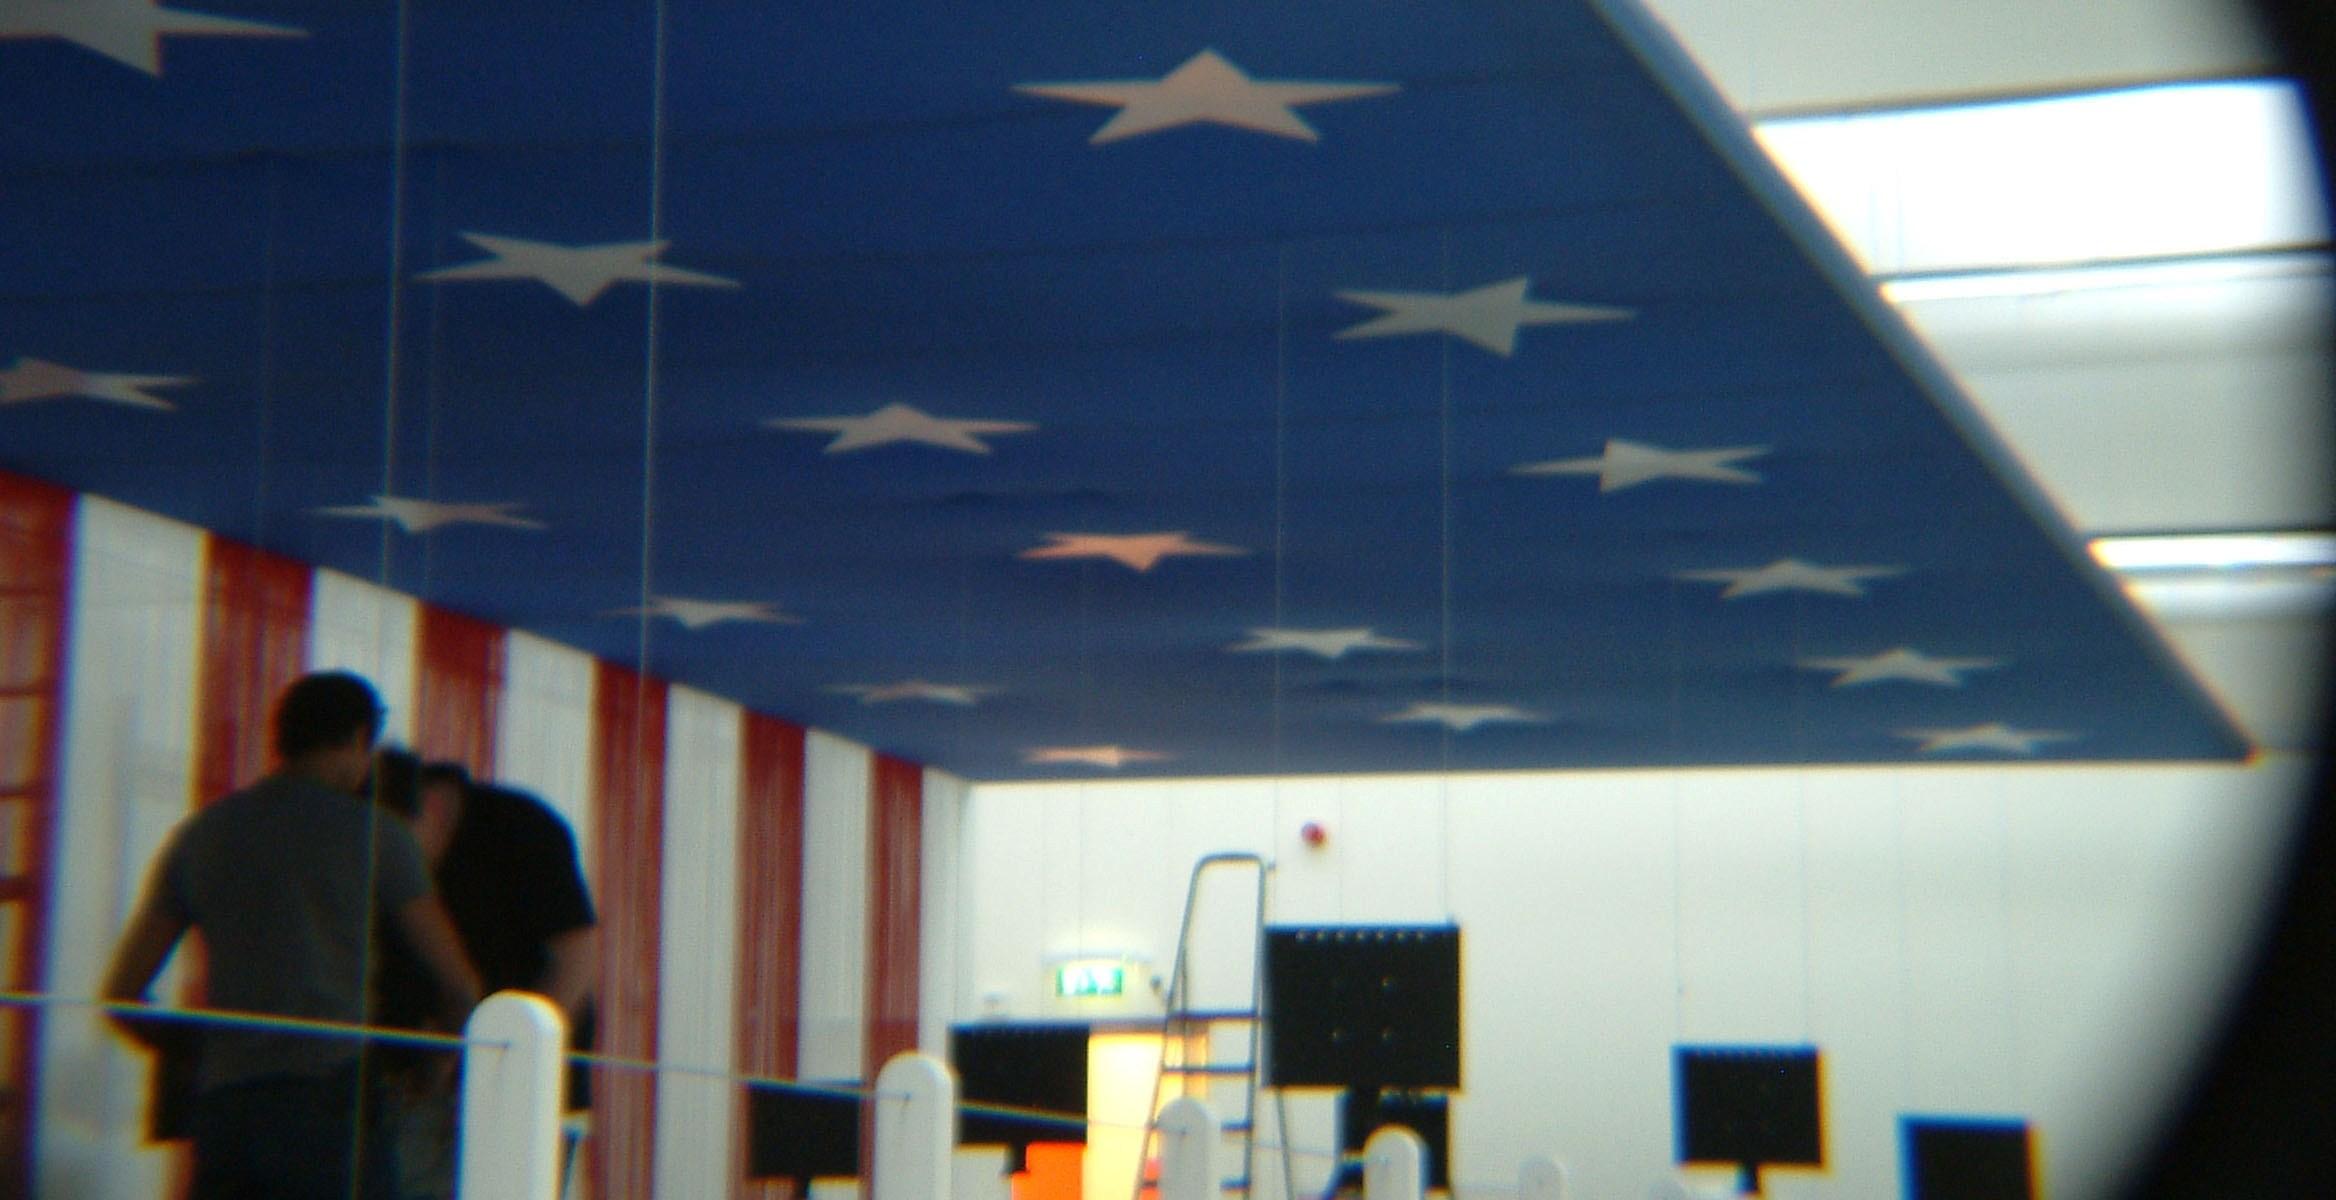 brandwerend flanel gespannen op kunstobjecten tijdens A. Warhol Exhibition Amsterdam